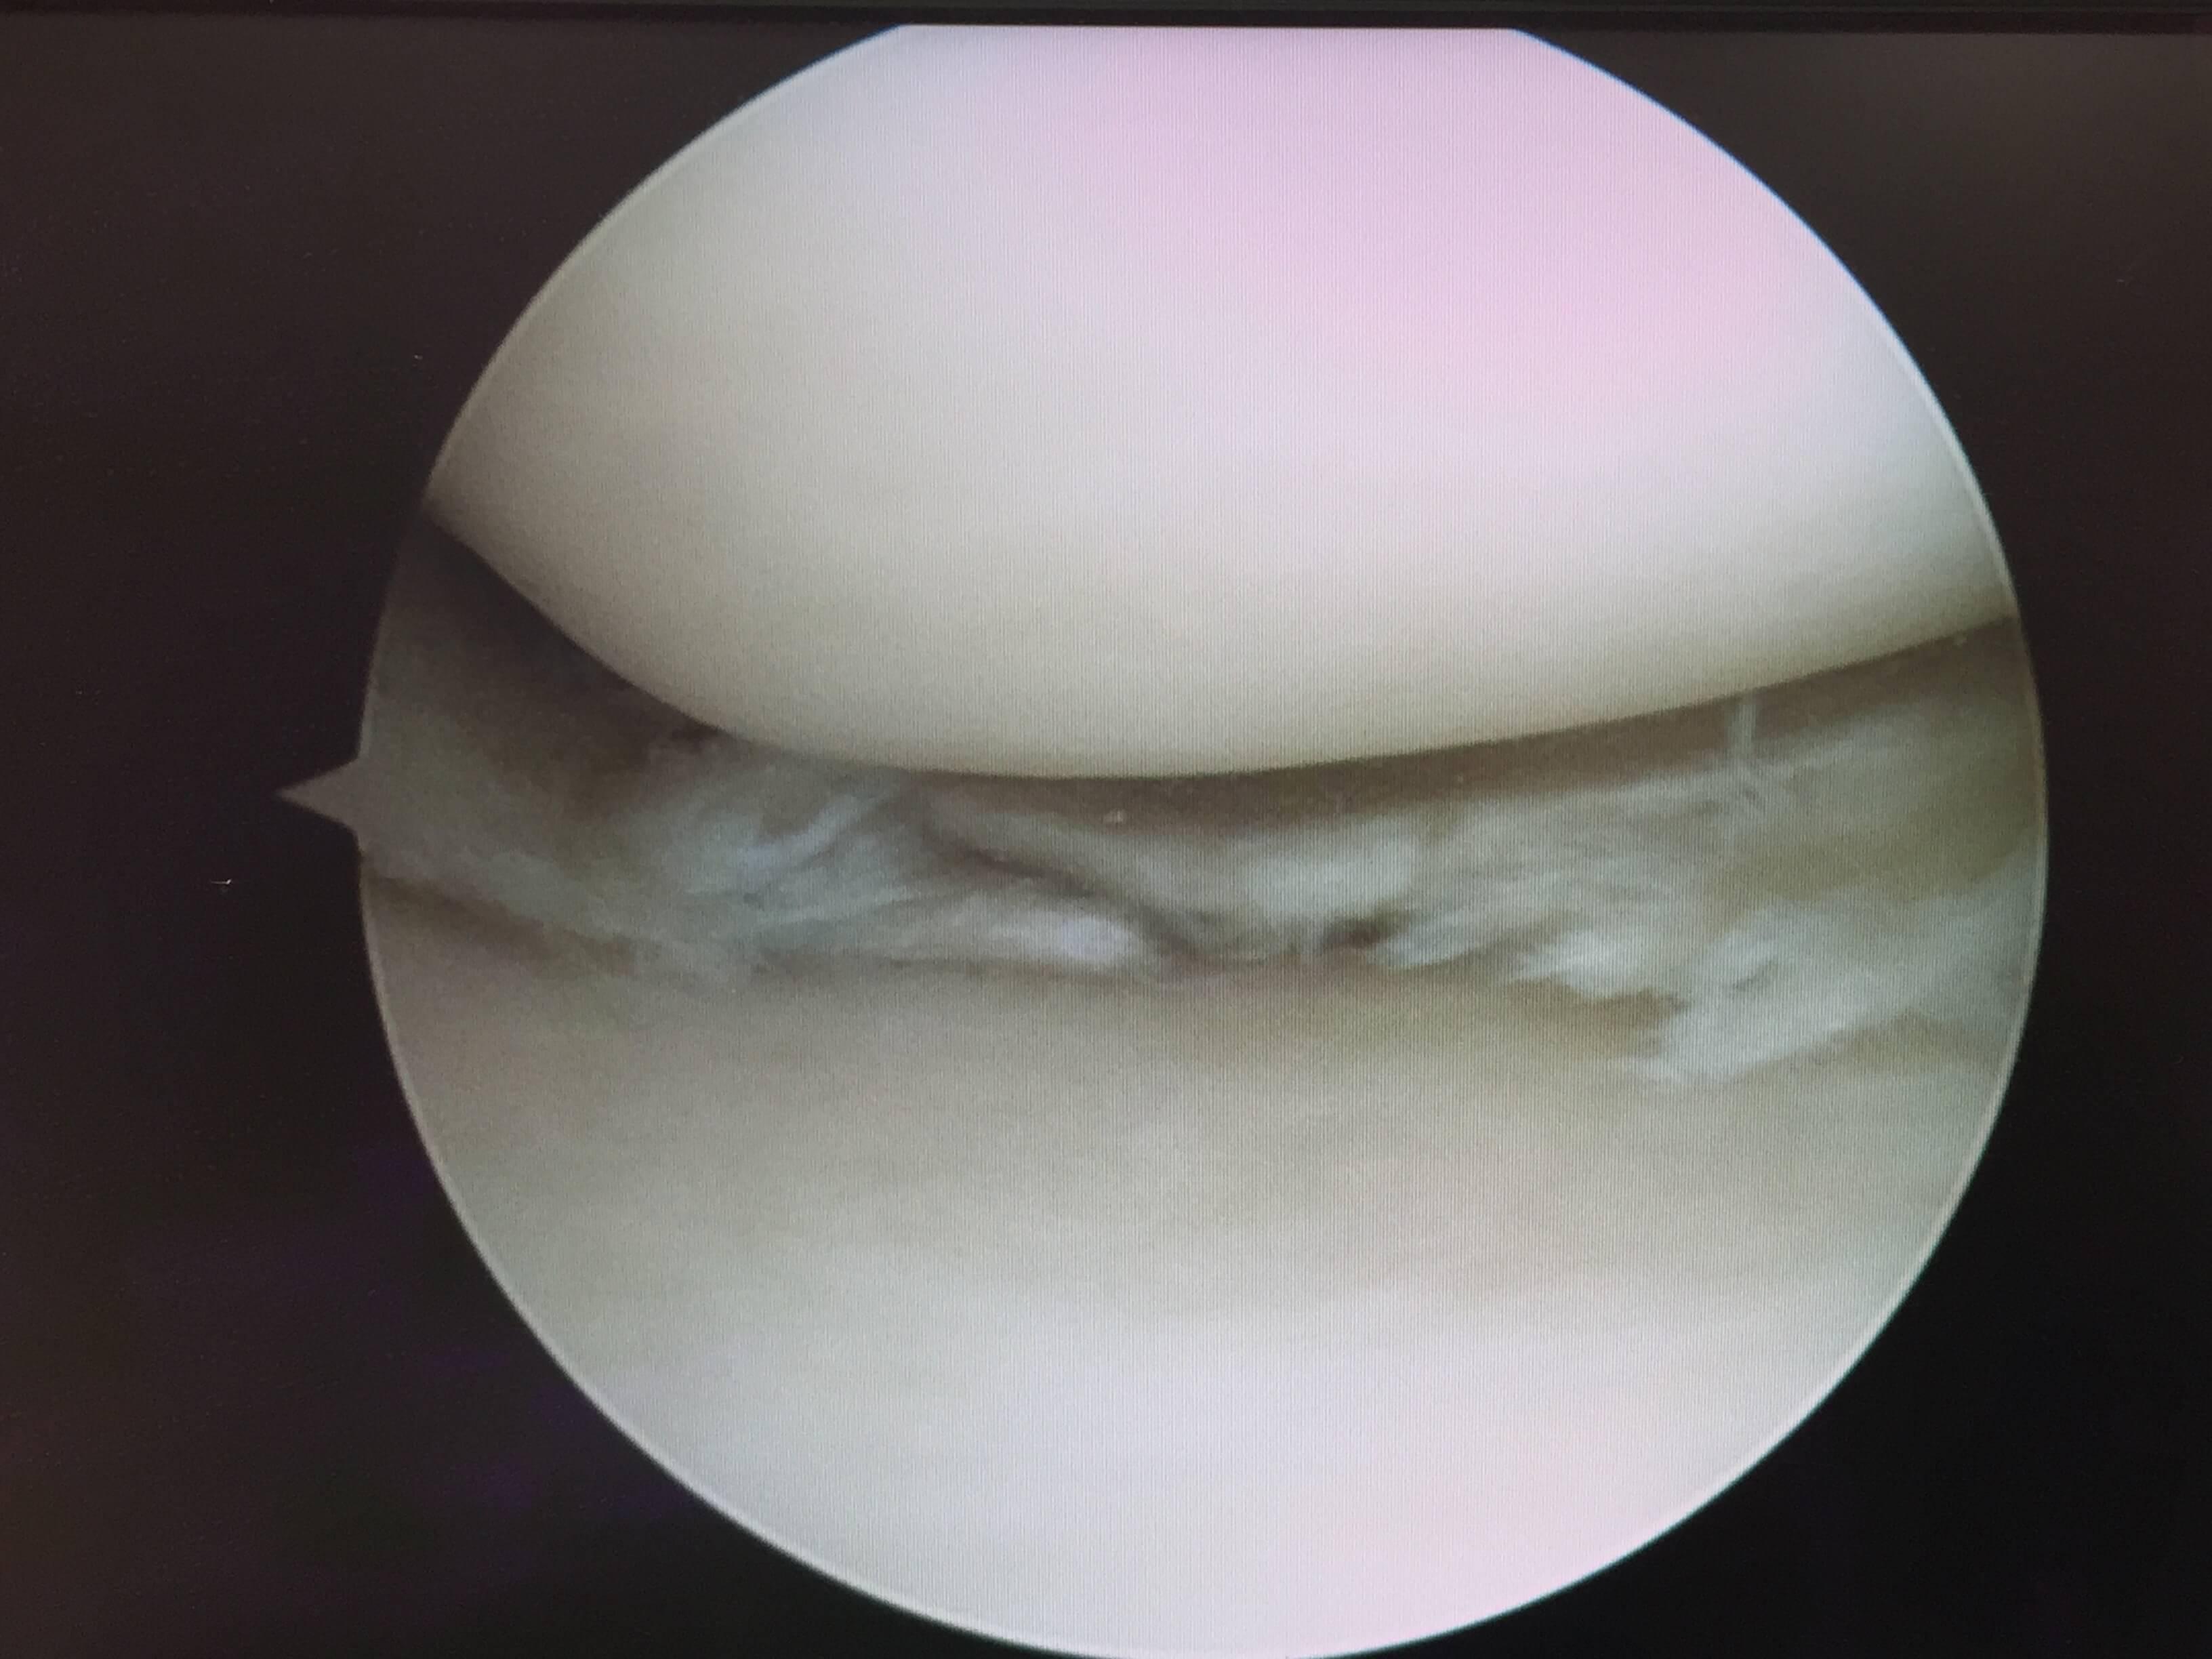 Orthopaedics Victoria : Patient Information - Knee